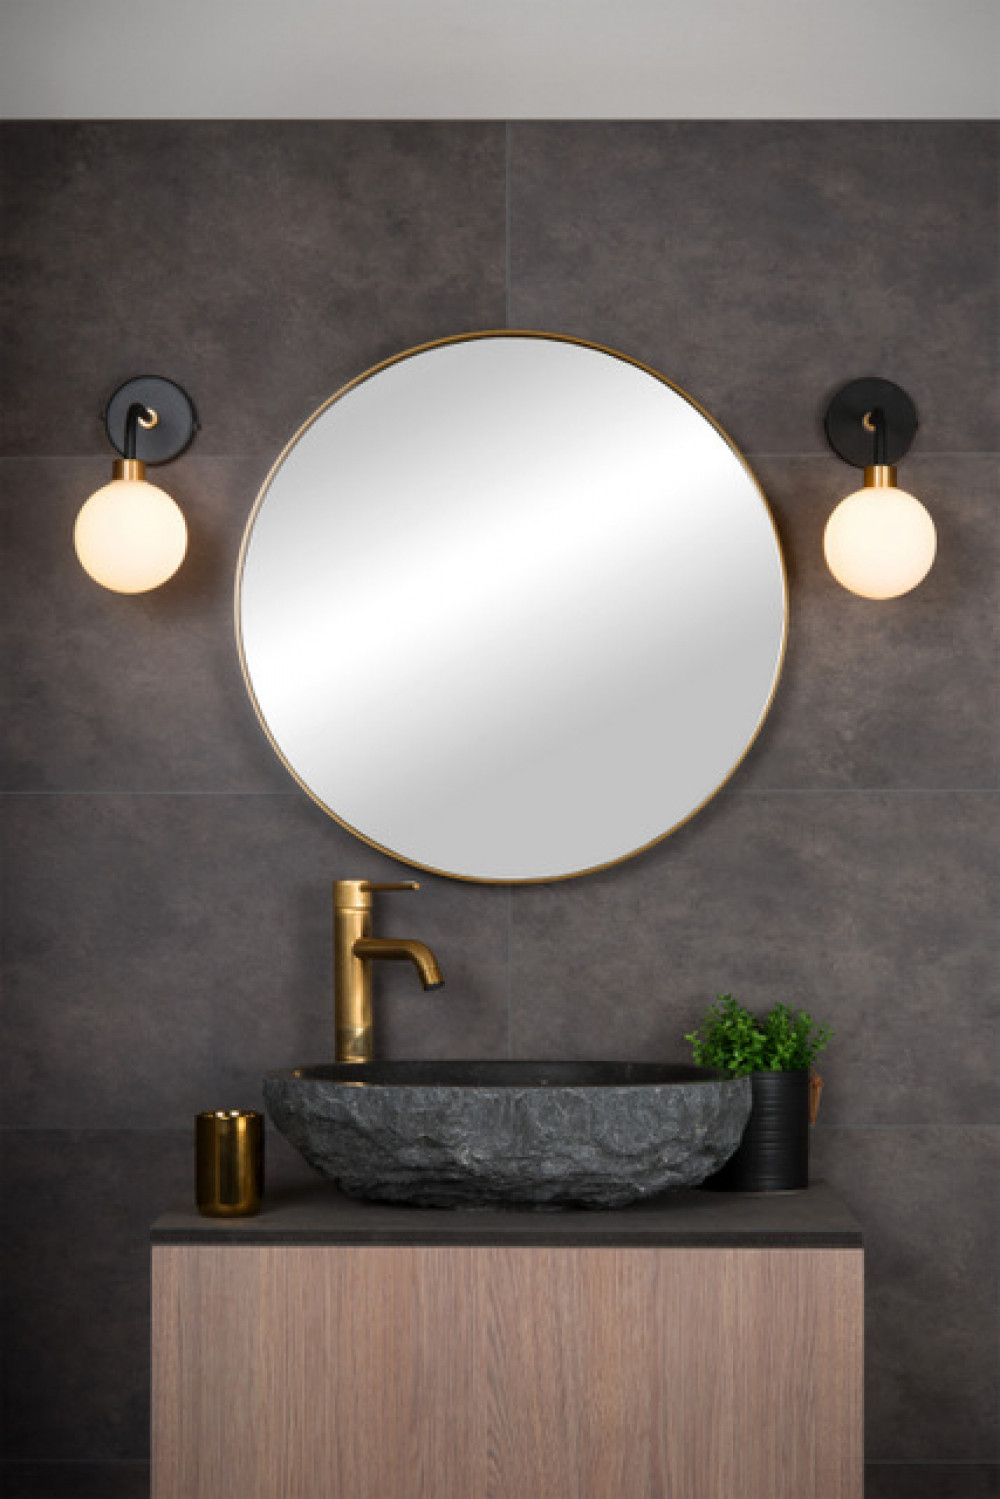 Wandlampe Badezimmer, schwarz/gold, 20xG20